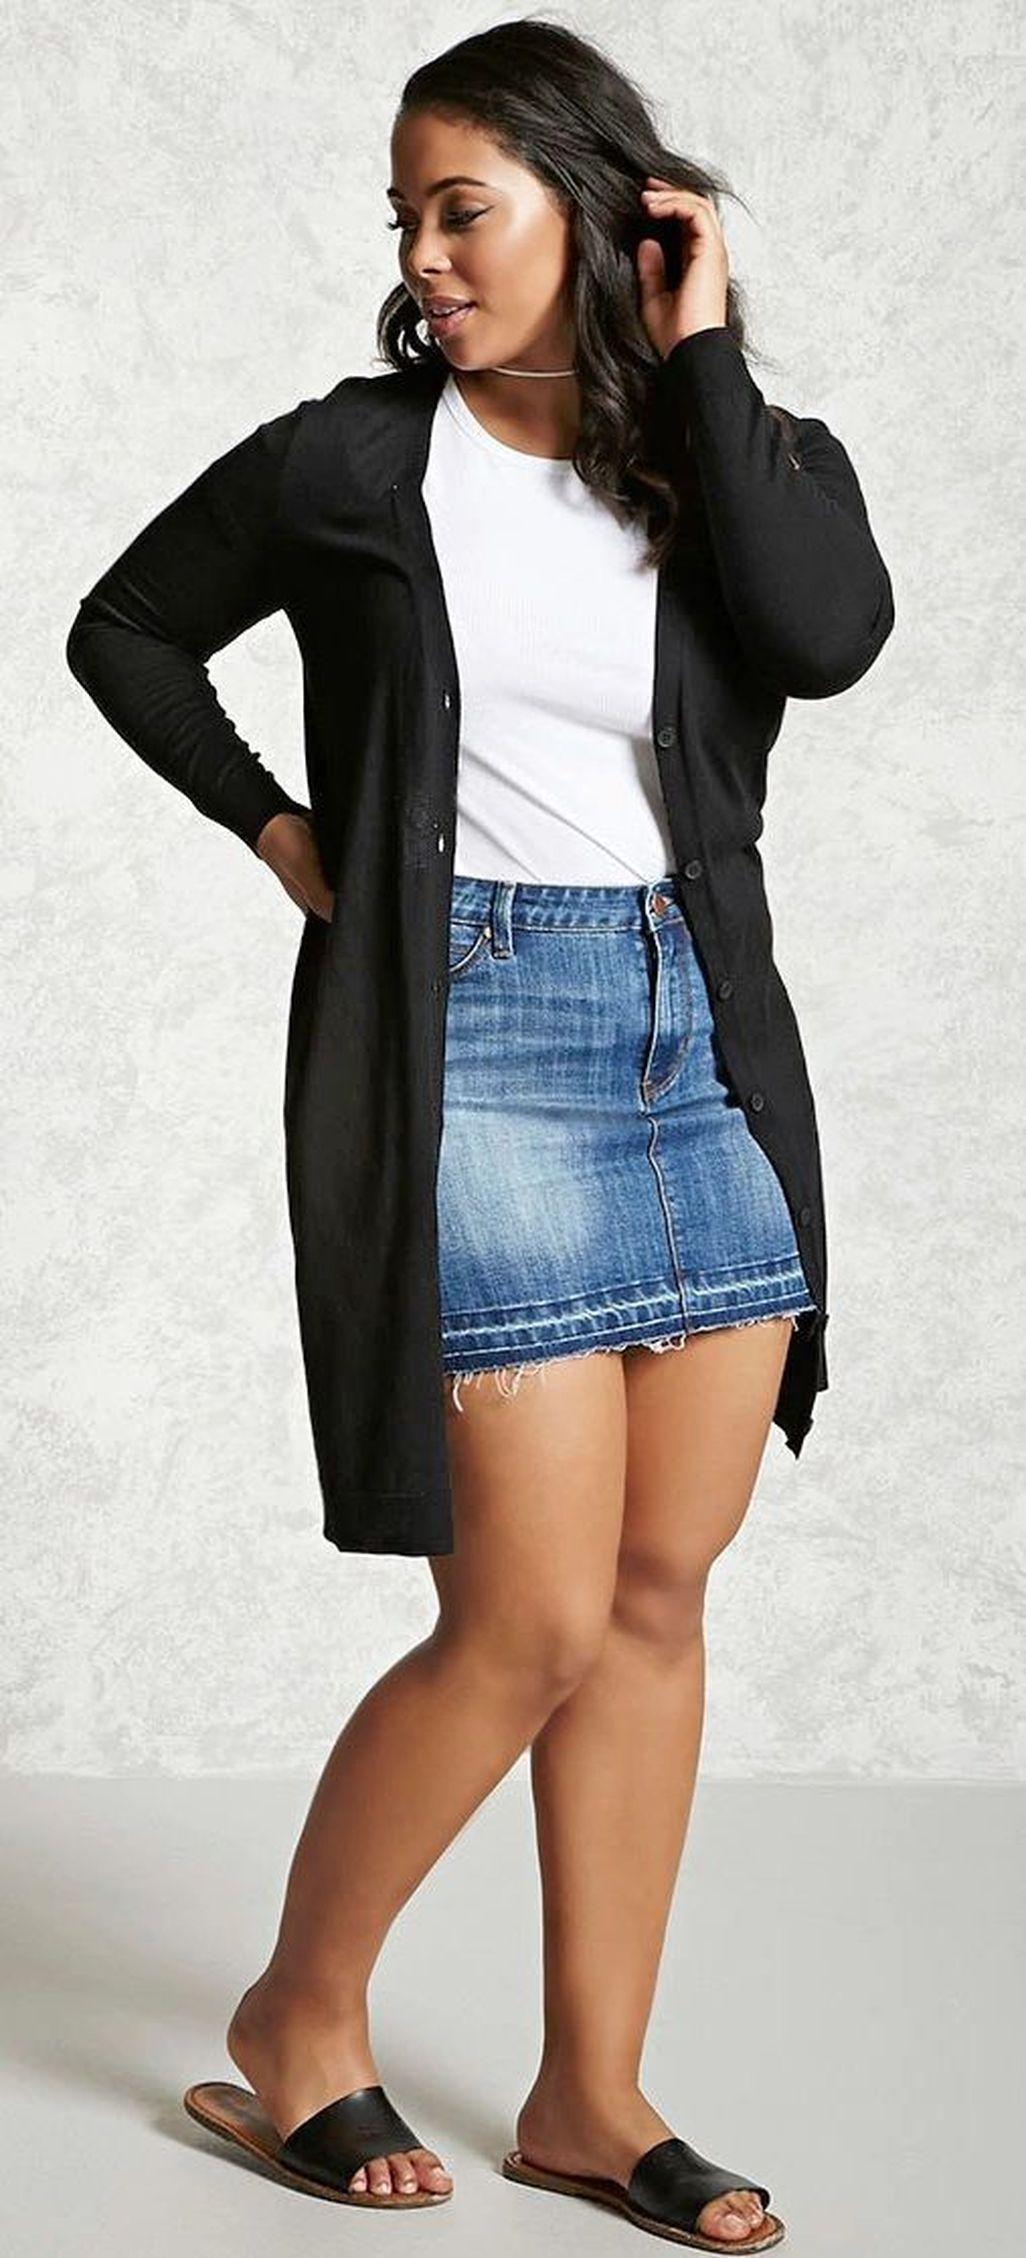 Curvy milf jean skirt | Hot pics)